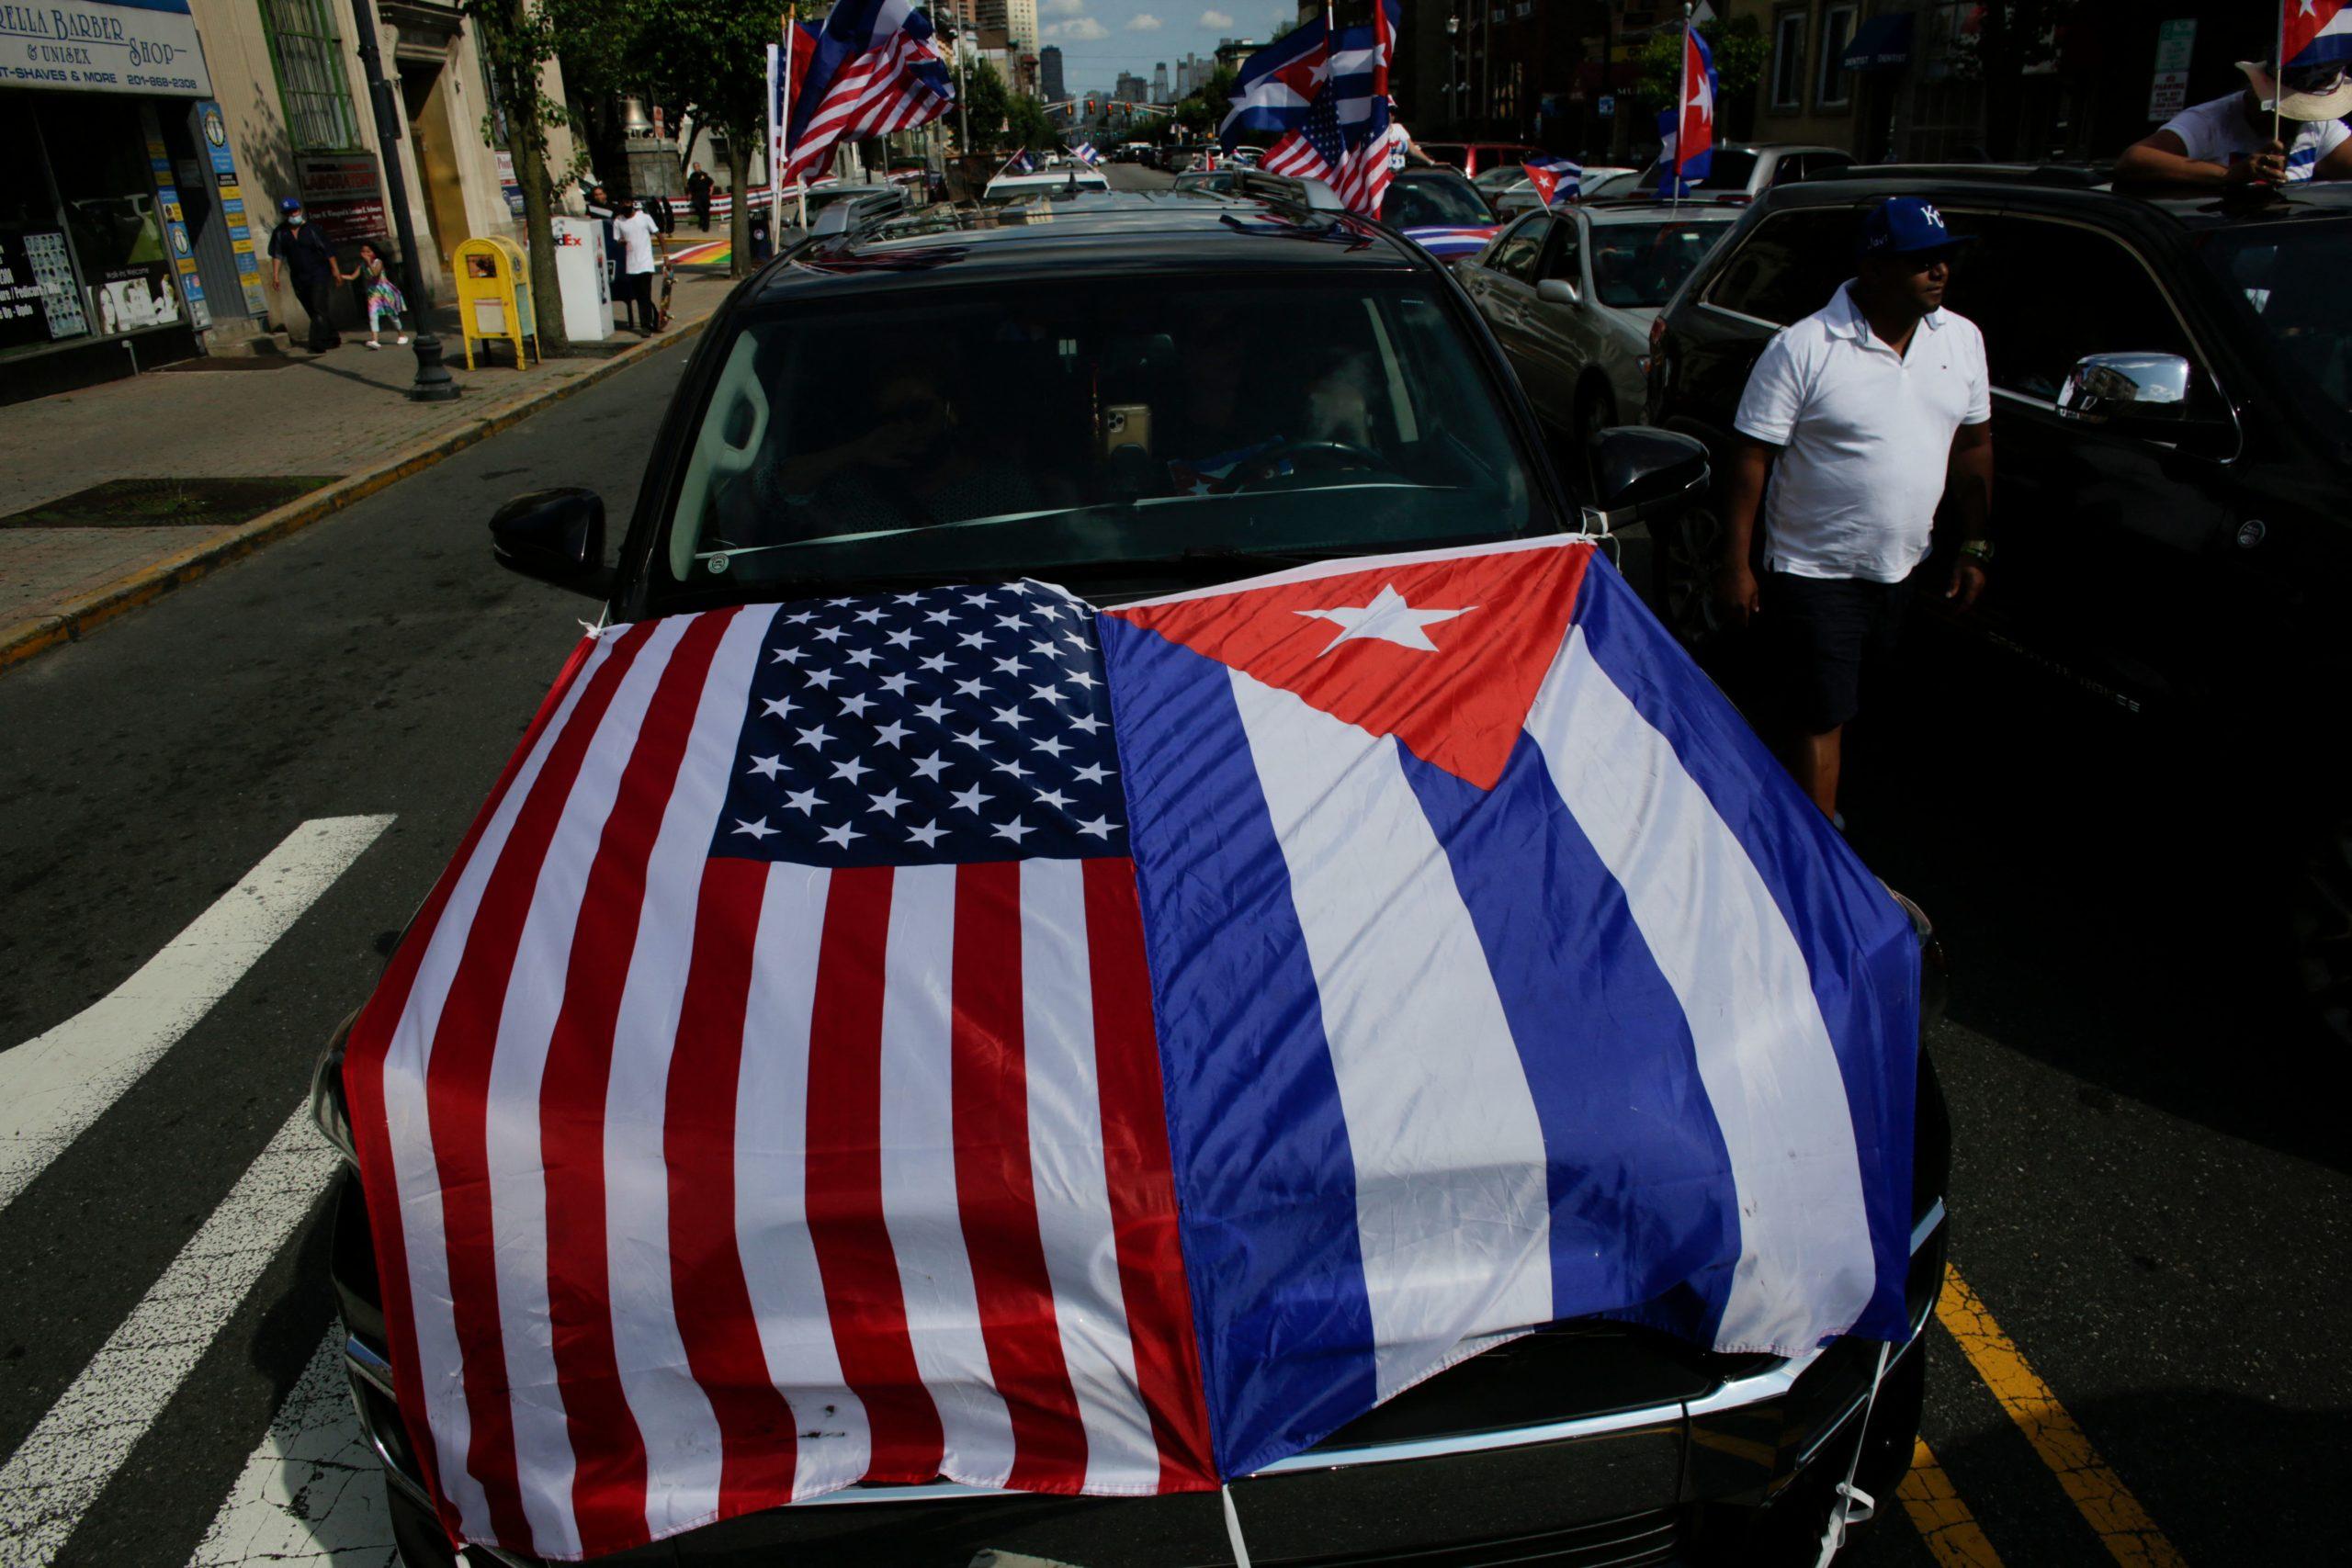 US-CUBA-DEMONSTRATION-POLITICS-GOVERNMENT-UNREST